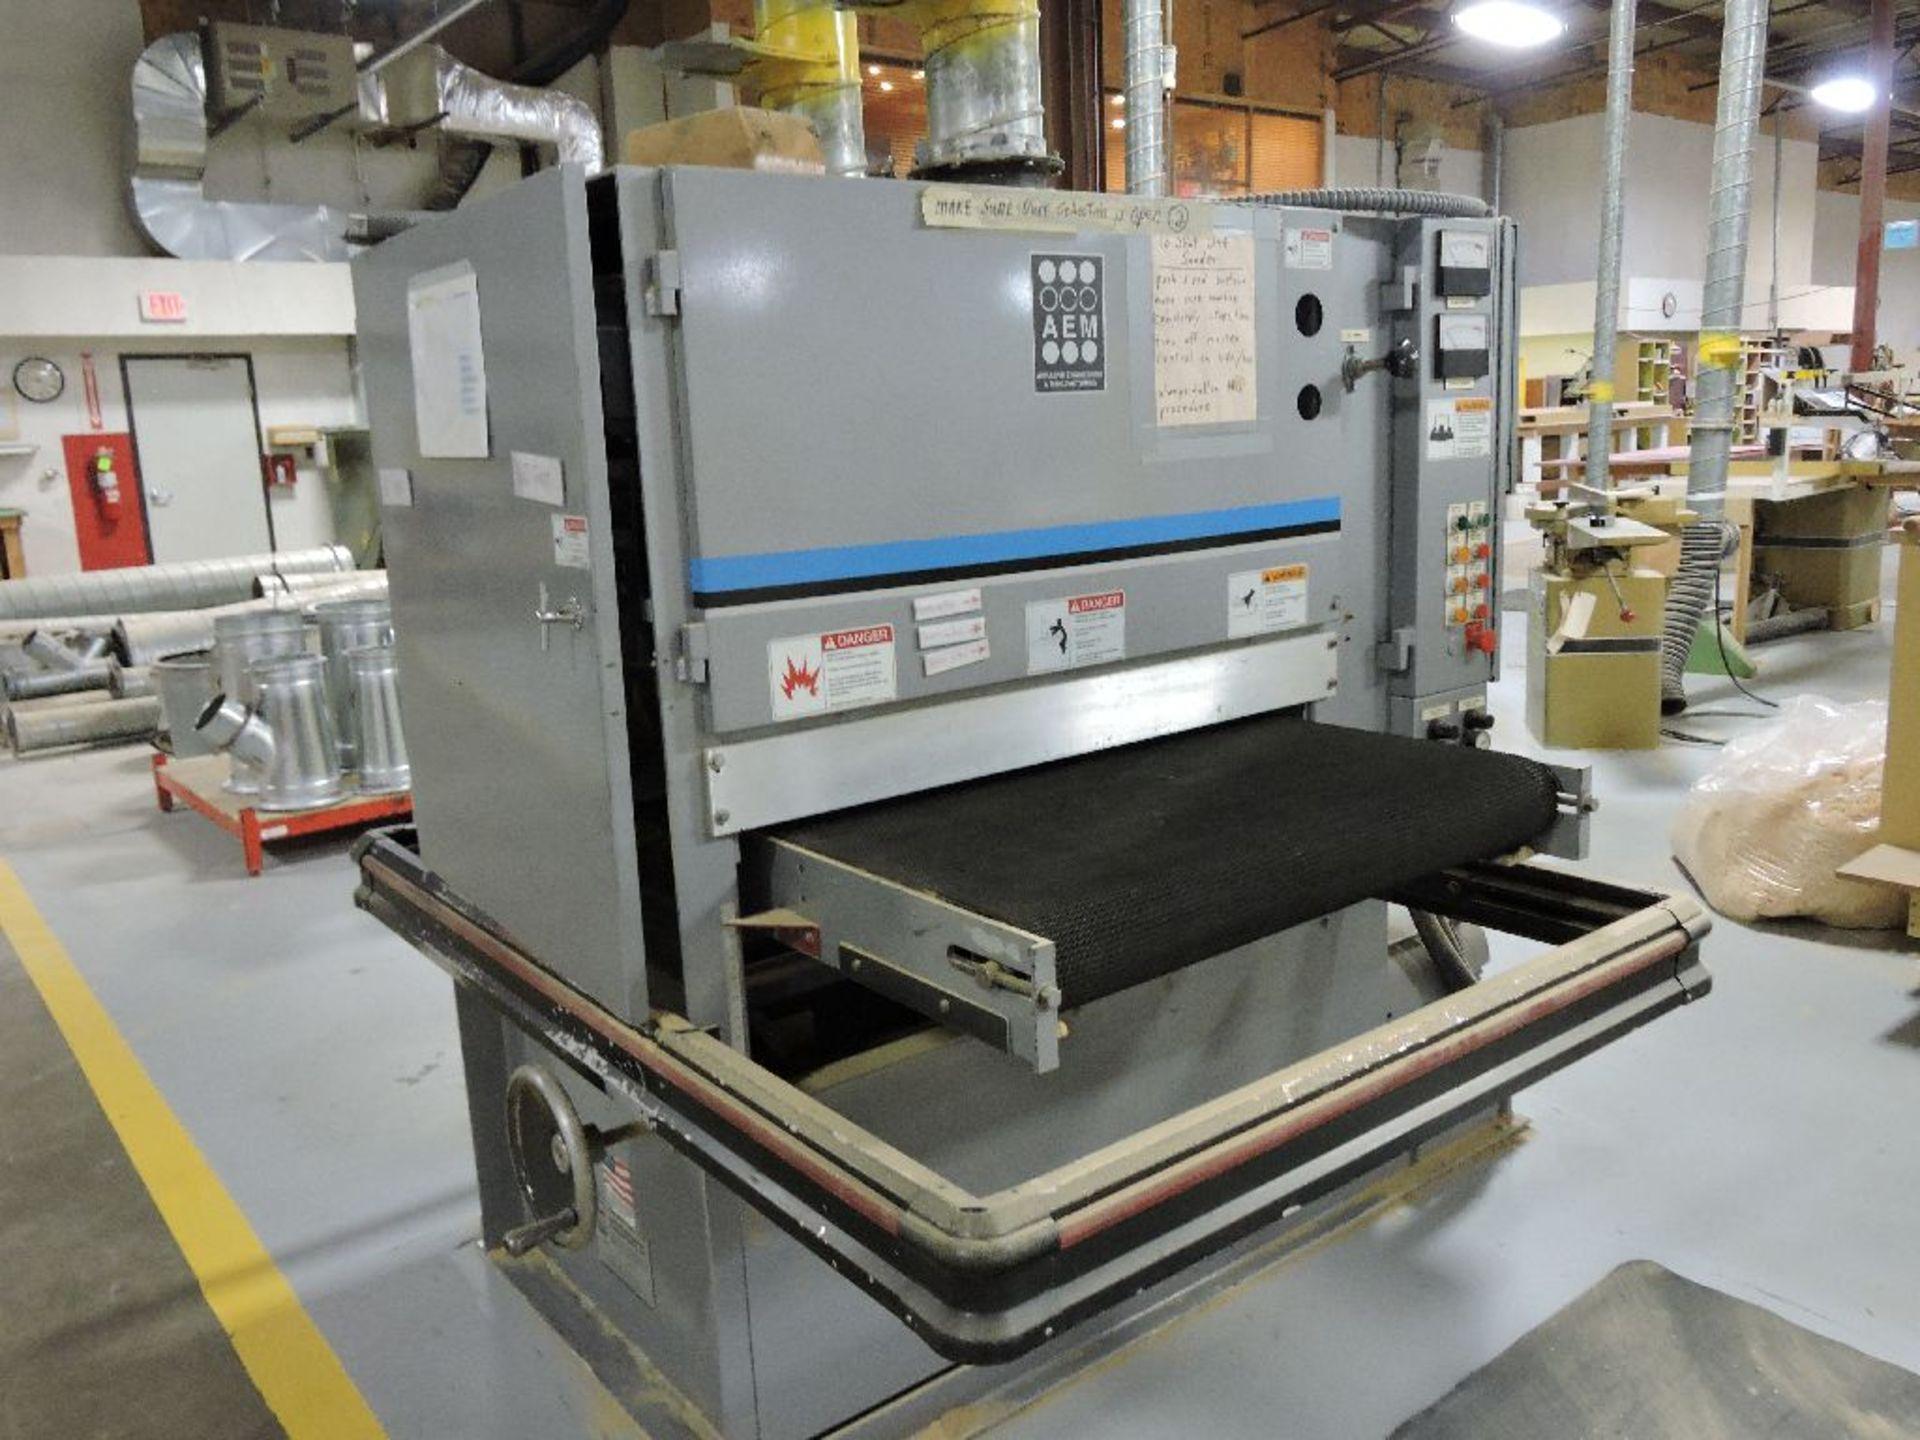 "Lot 006 - AEM belt sander, model 402-37, sn 00100, 36"", MO6930, 20 hp. - 15 hp. dual drum, 2 head wide"